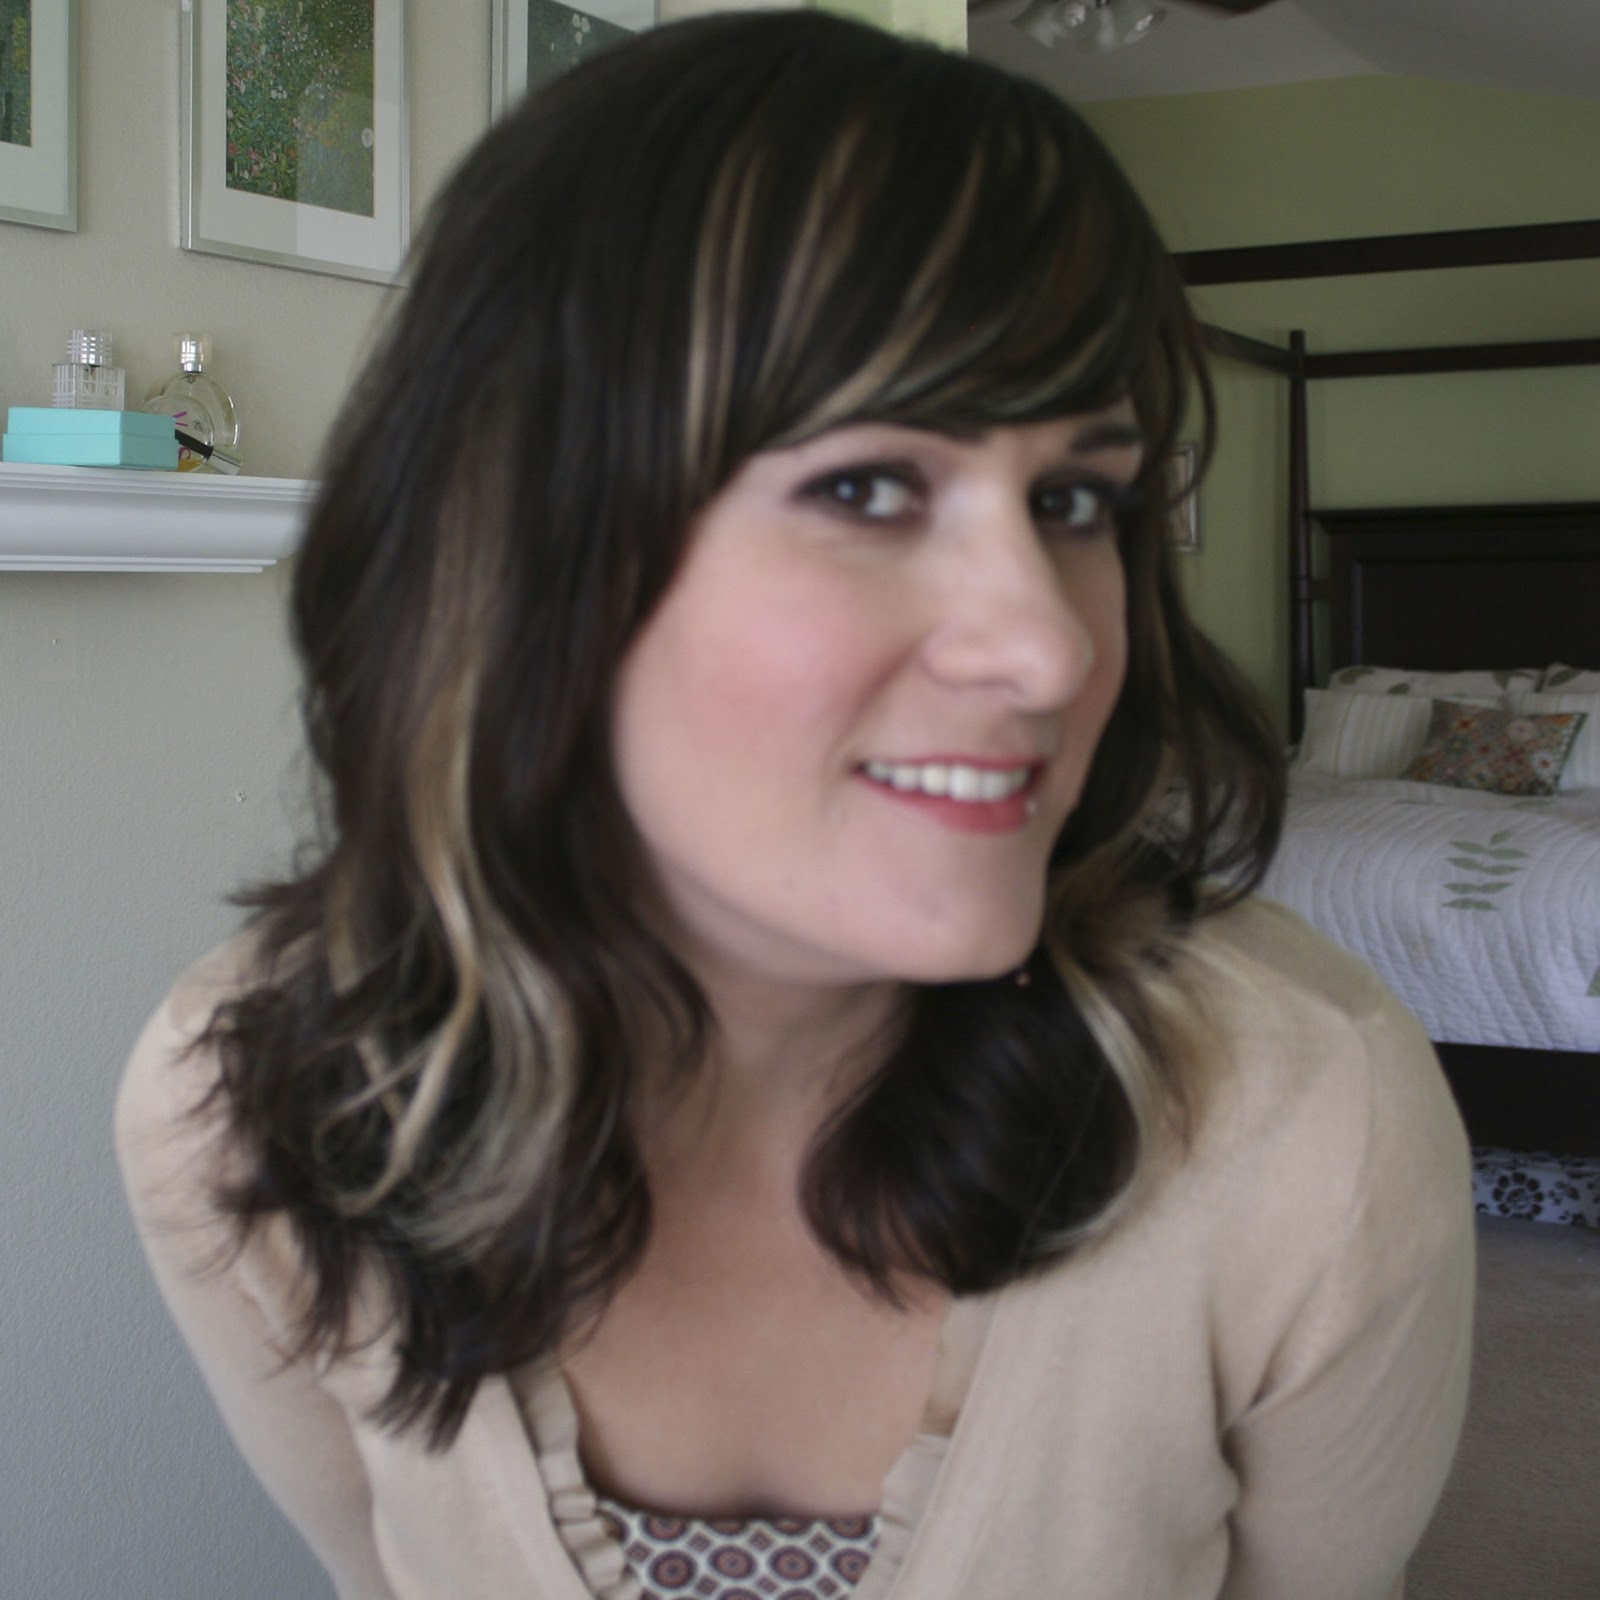 kitsch by kat hair challenge day 9 diy peek a boo highlight. Black Bedroom Furniture Sets. Home Design Ideas